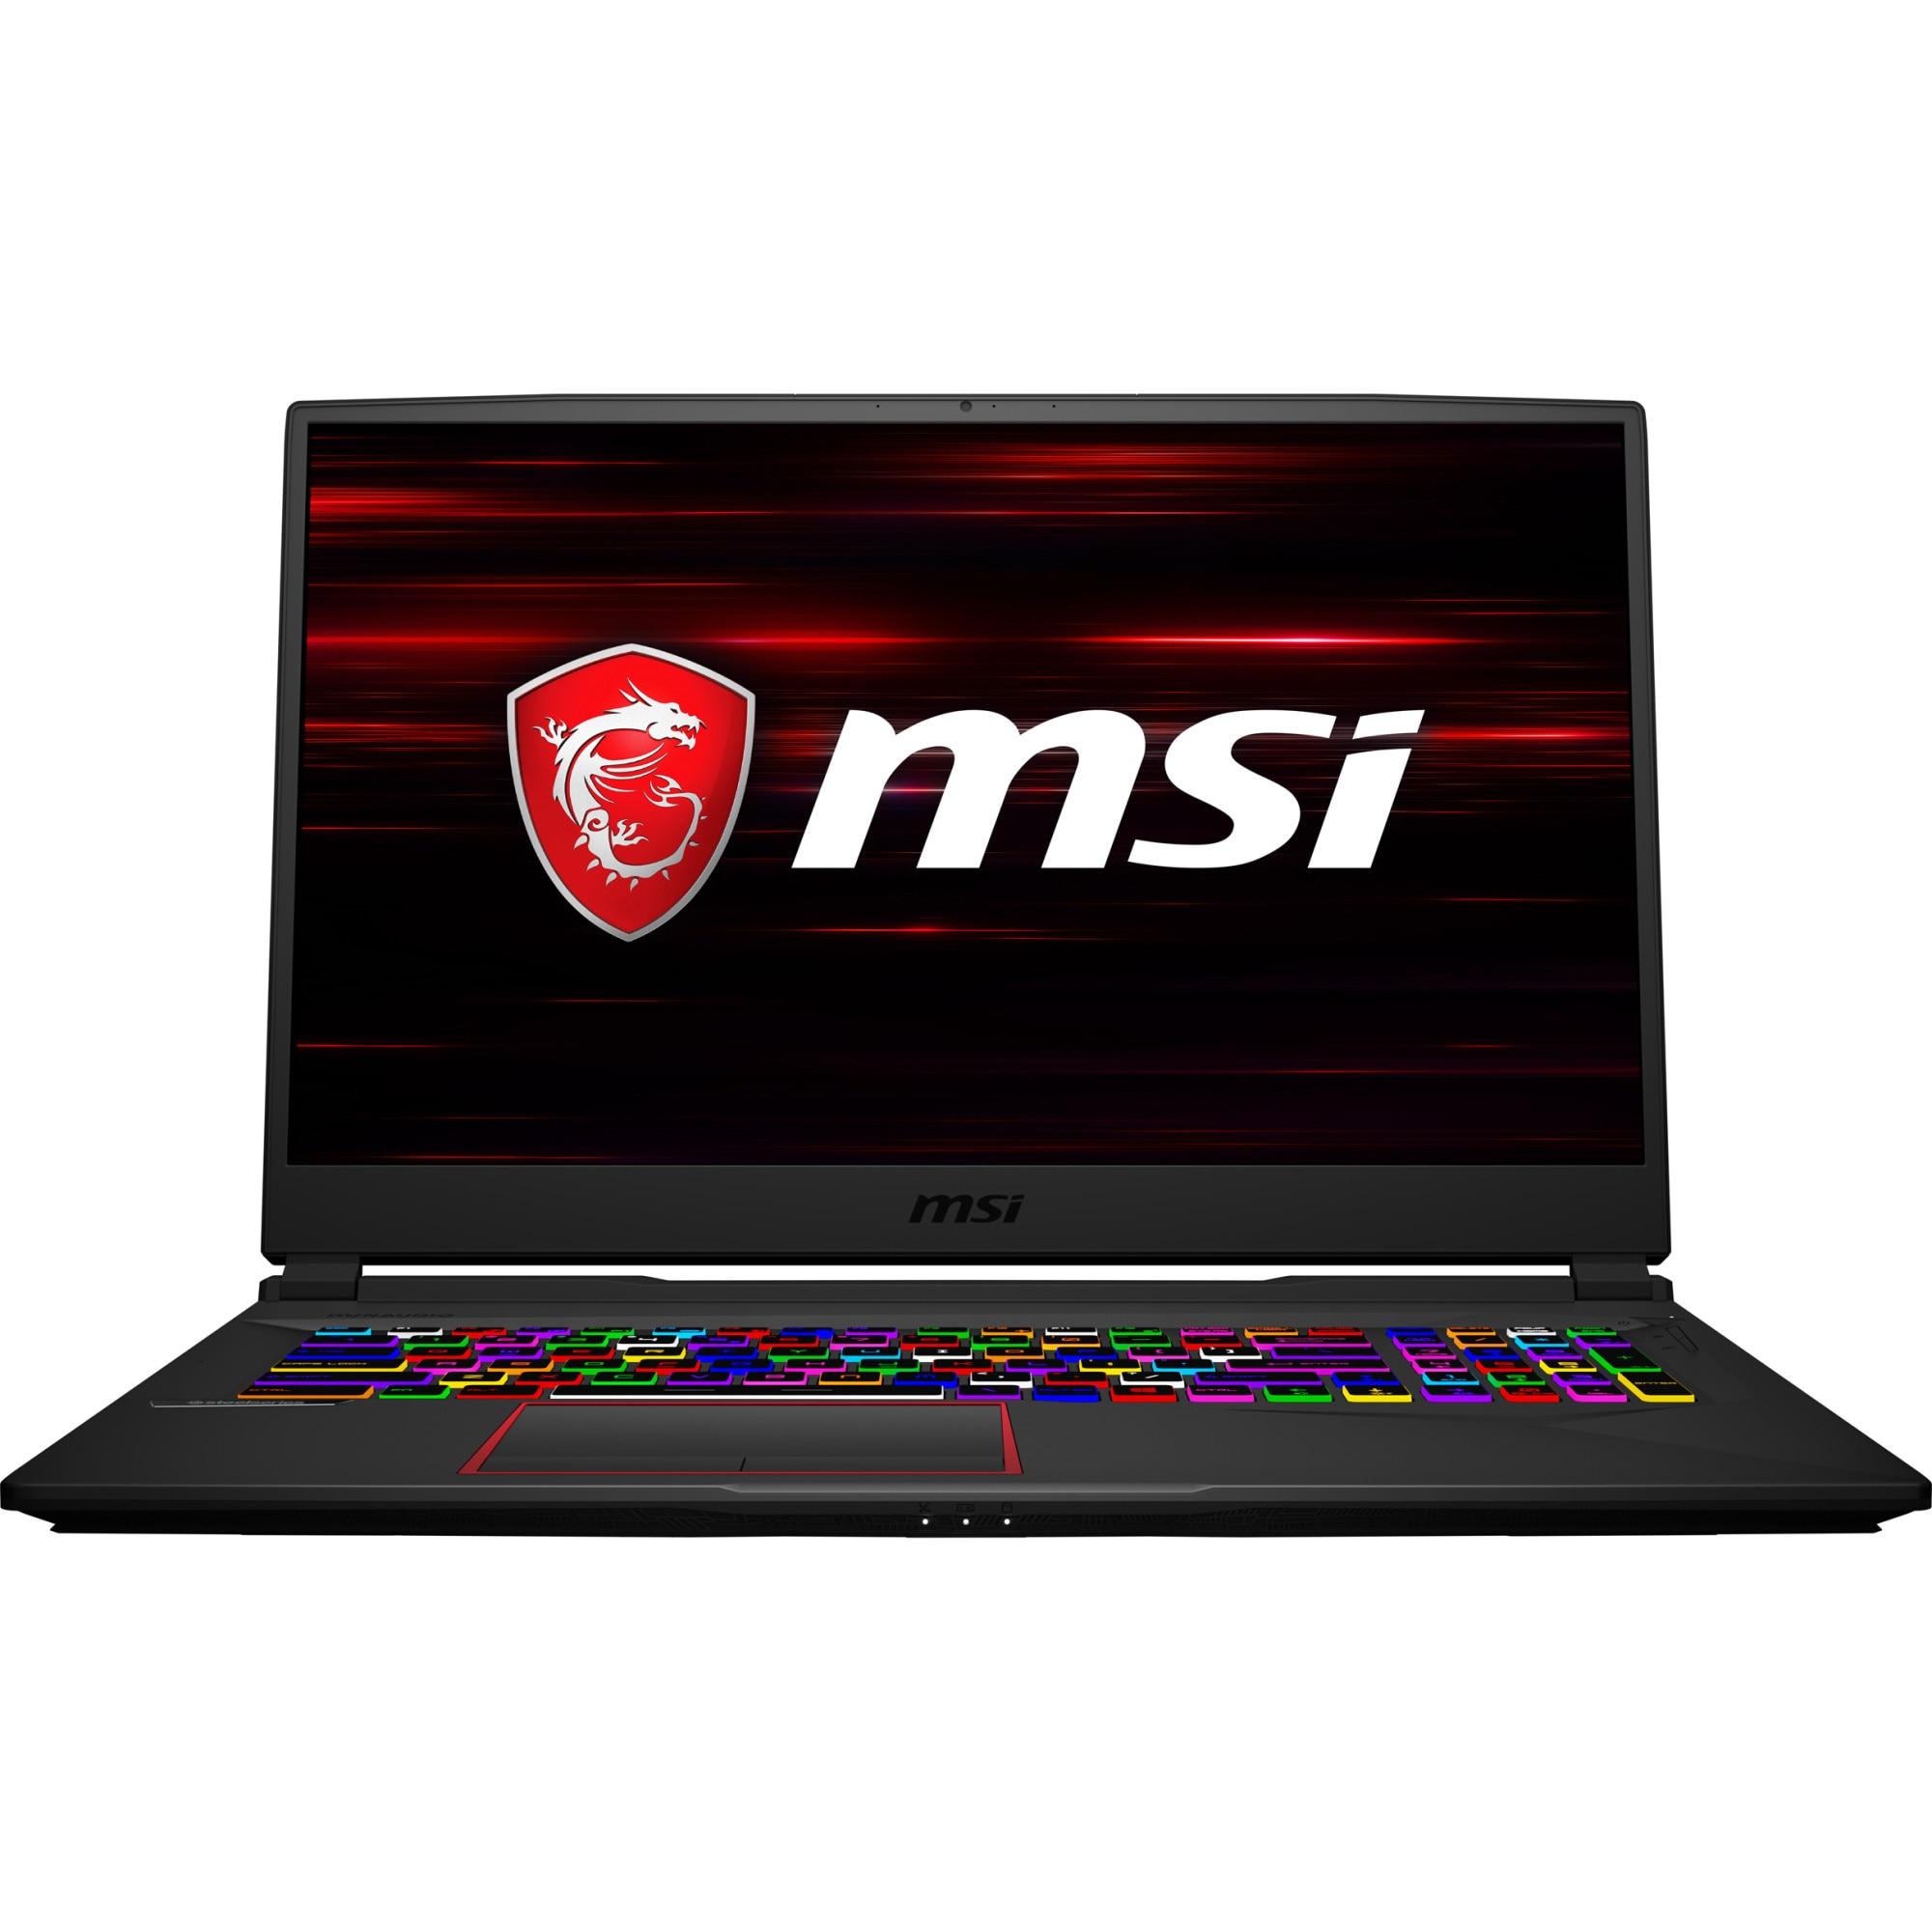 "Fotografie Laptop Gaming MSI GE75 Raider 8SF cu procesor Intel® Core™ i7-8750H pana la 4.10 GHz, Coffee Lake, 17.3"", Full HD, 144Hz, 3ms, IPS, 16GB, 1TB + 256GB SSD, NVIDIA GeForce RTX 2070 8GB, Free DOS, Black"